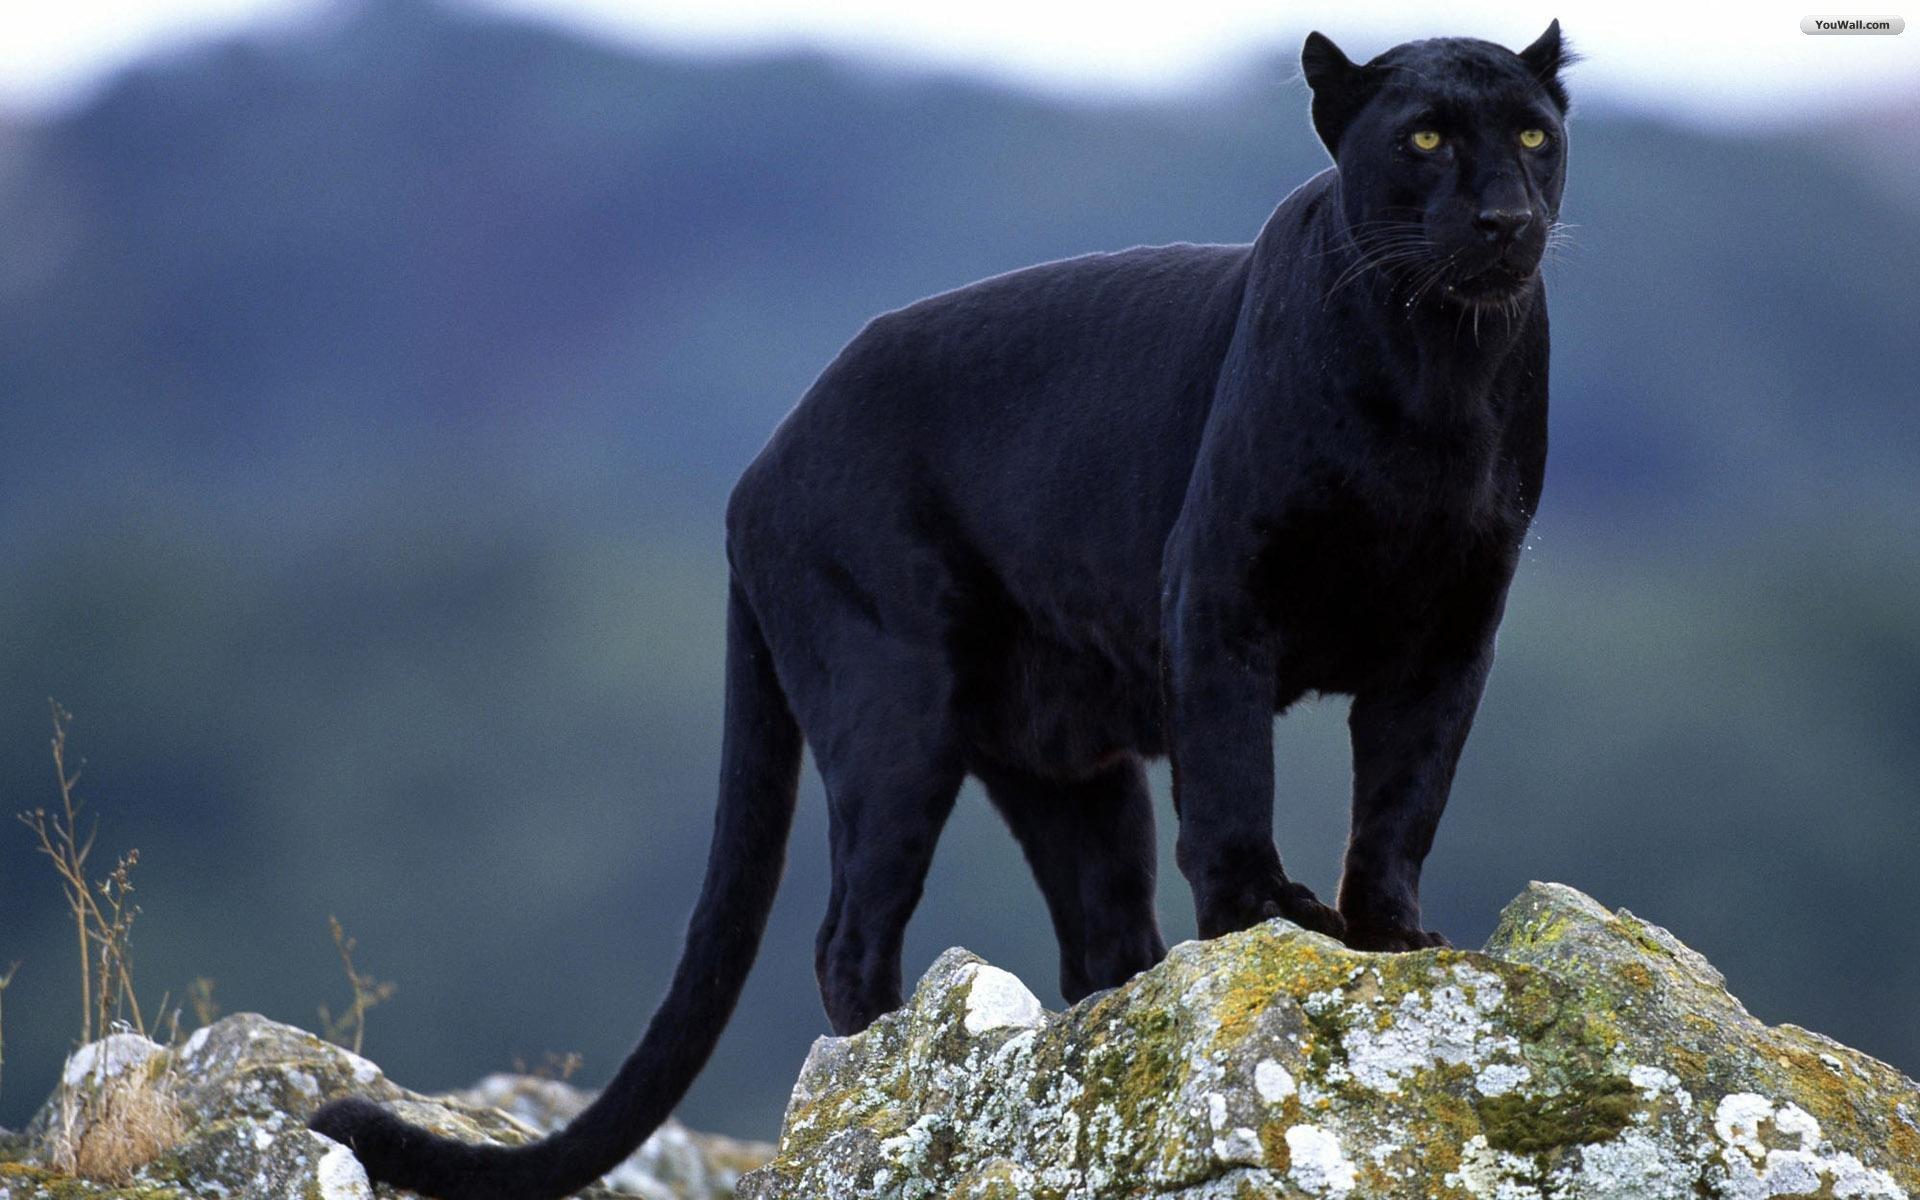 Black Jaguar Animal Wallpaper For Desktop